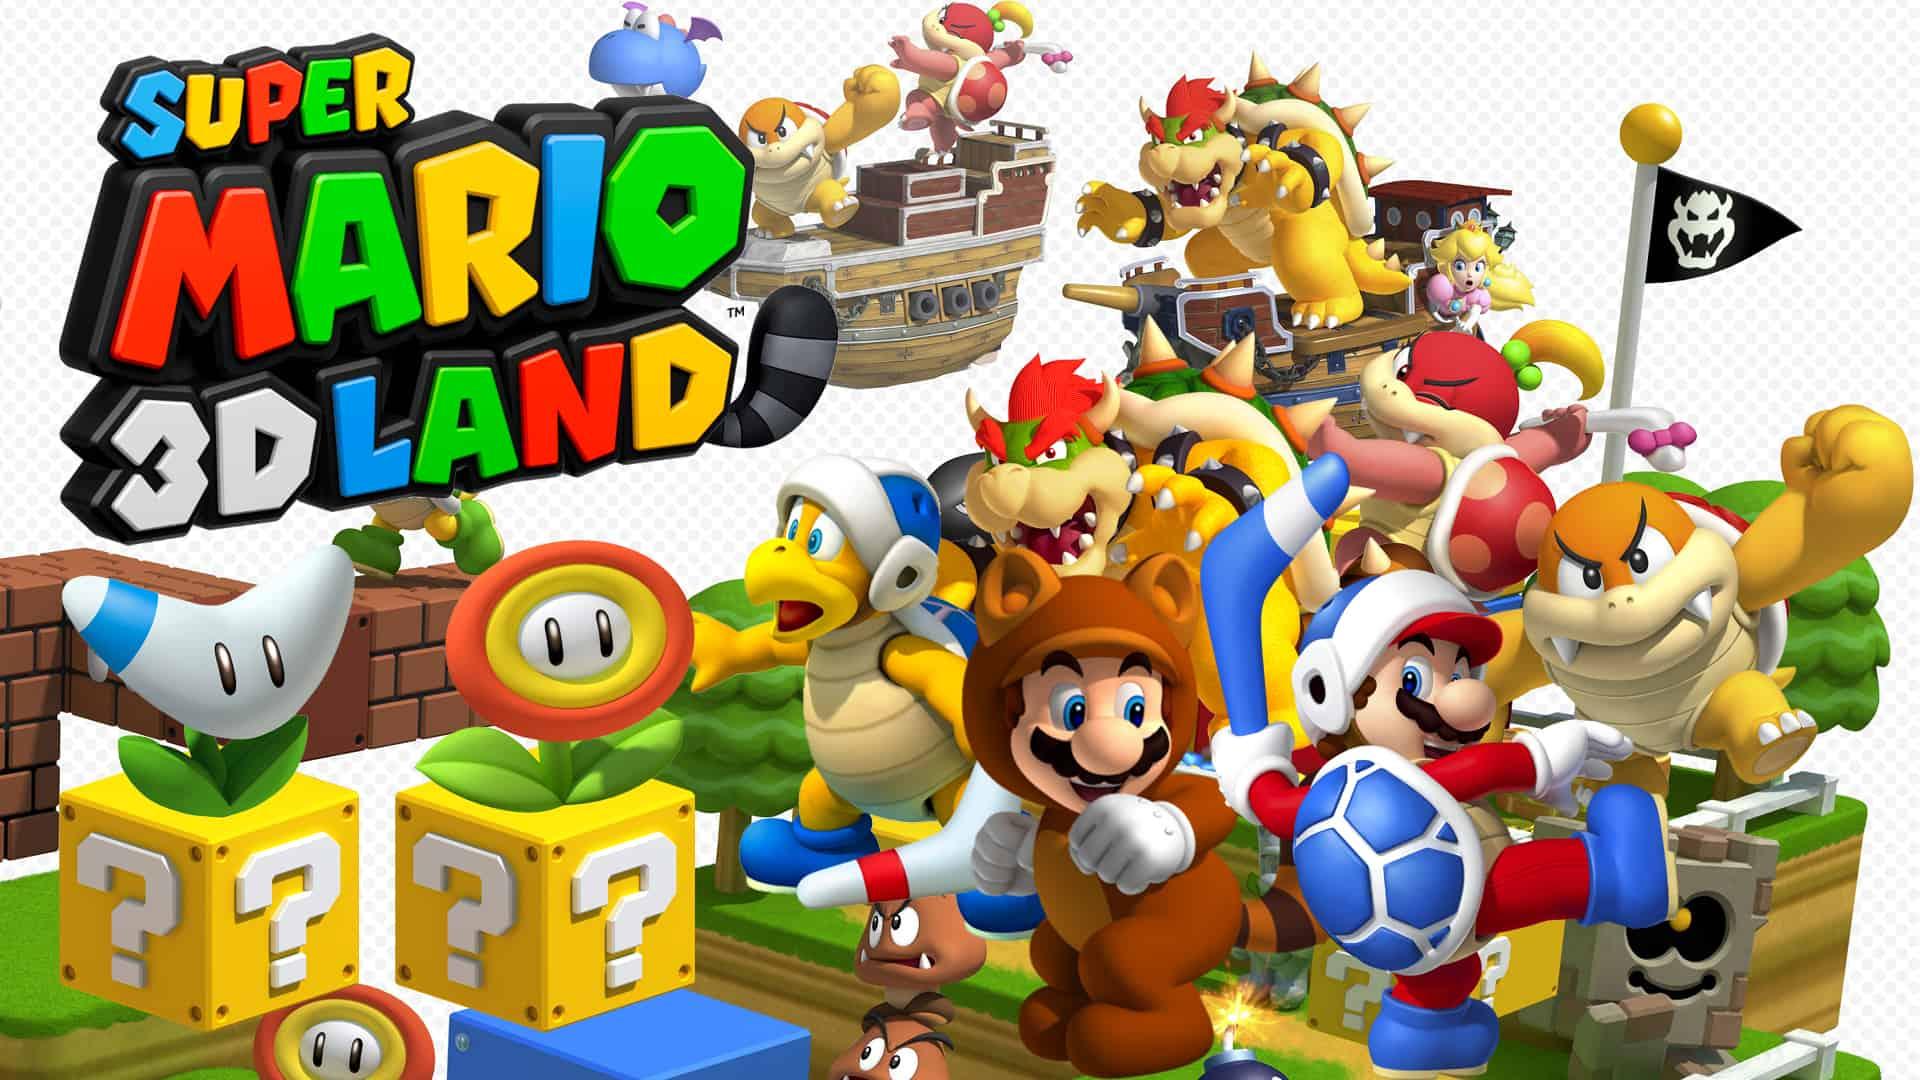 Best Super Mario Games - 3D Land